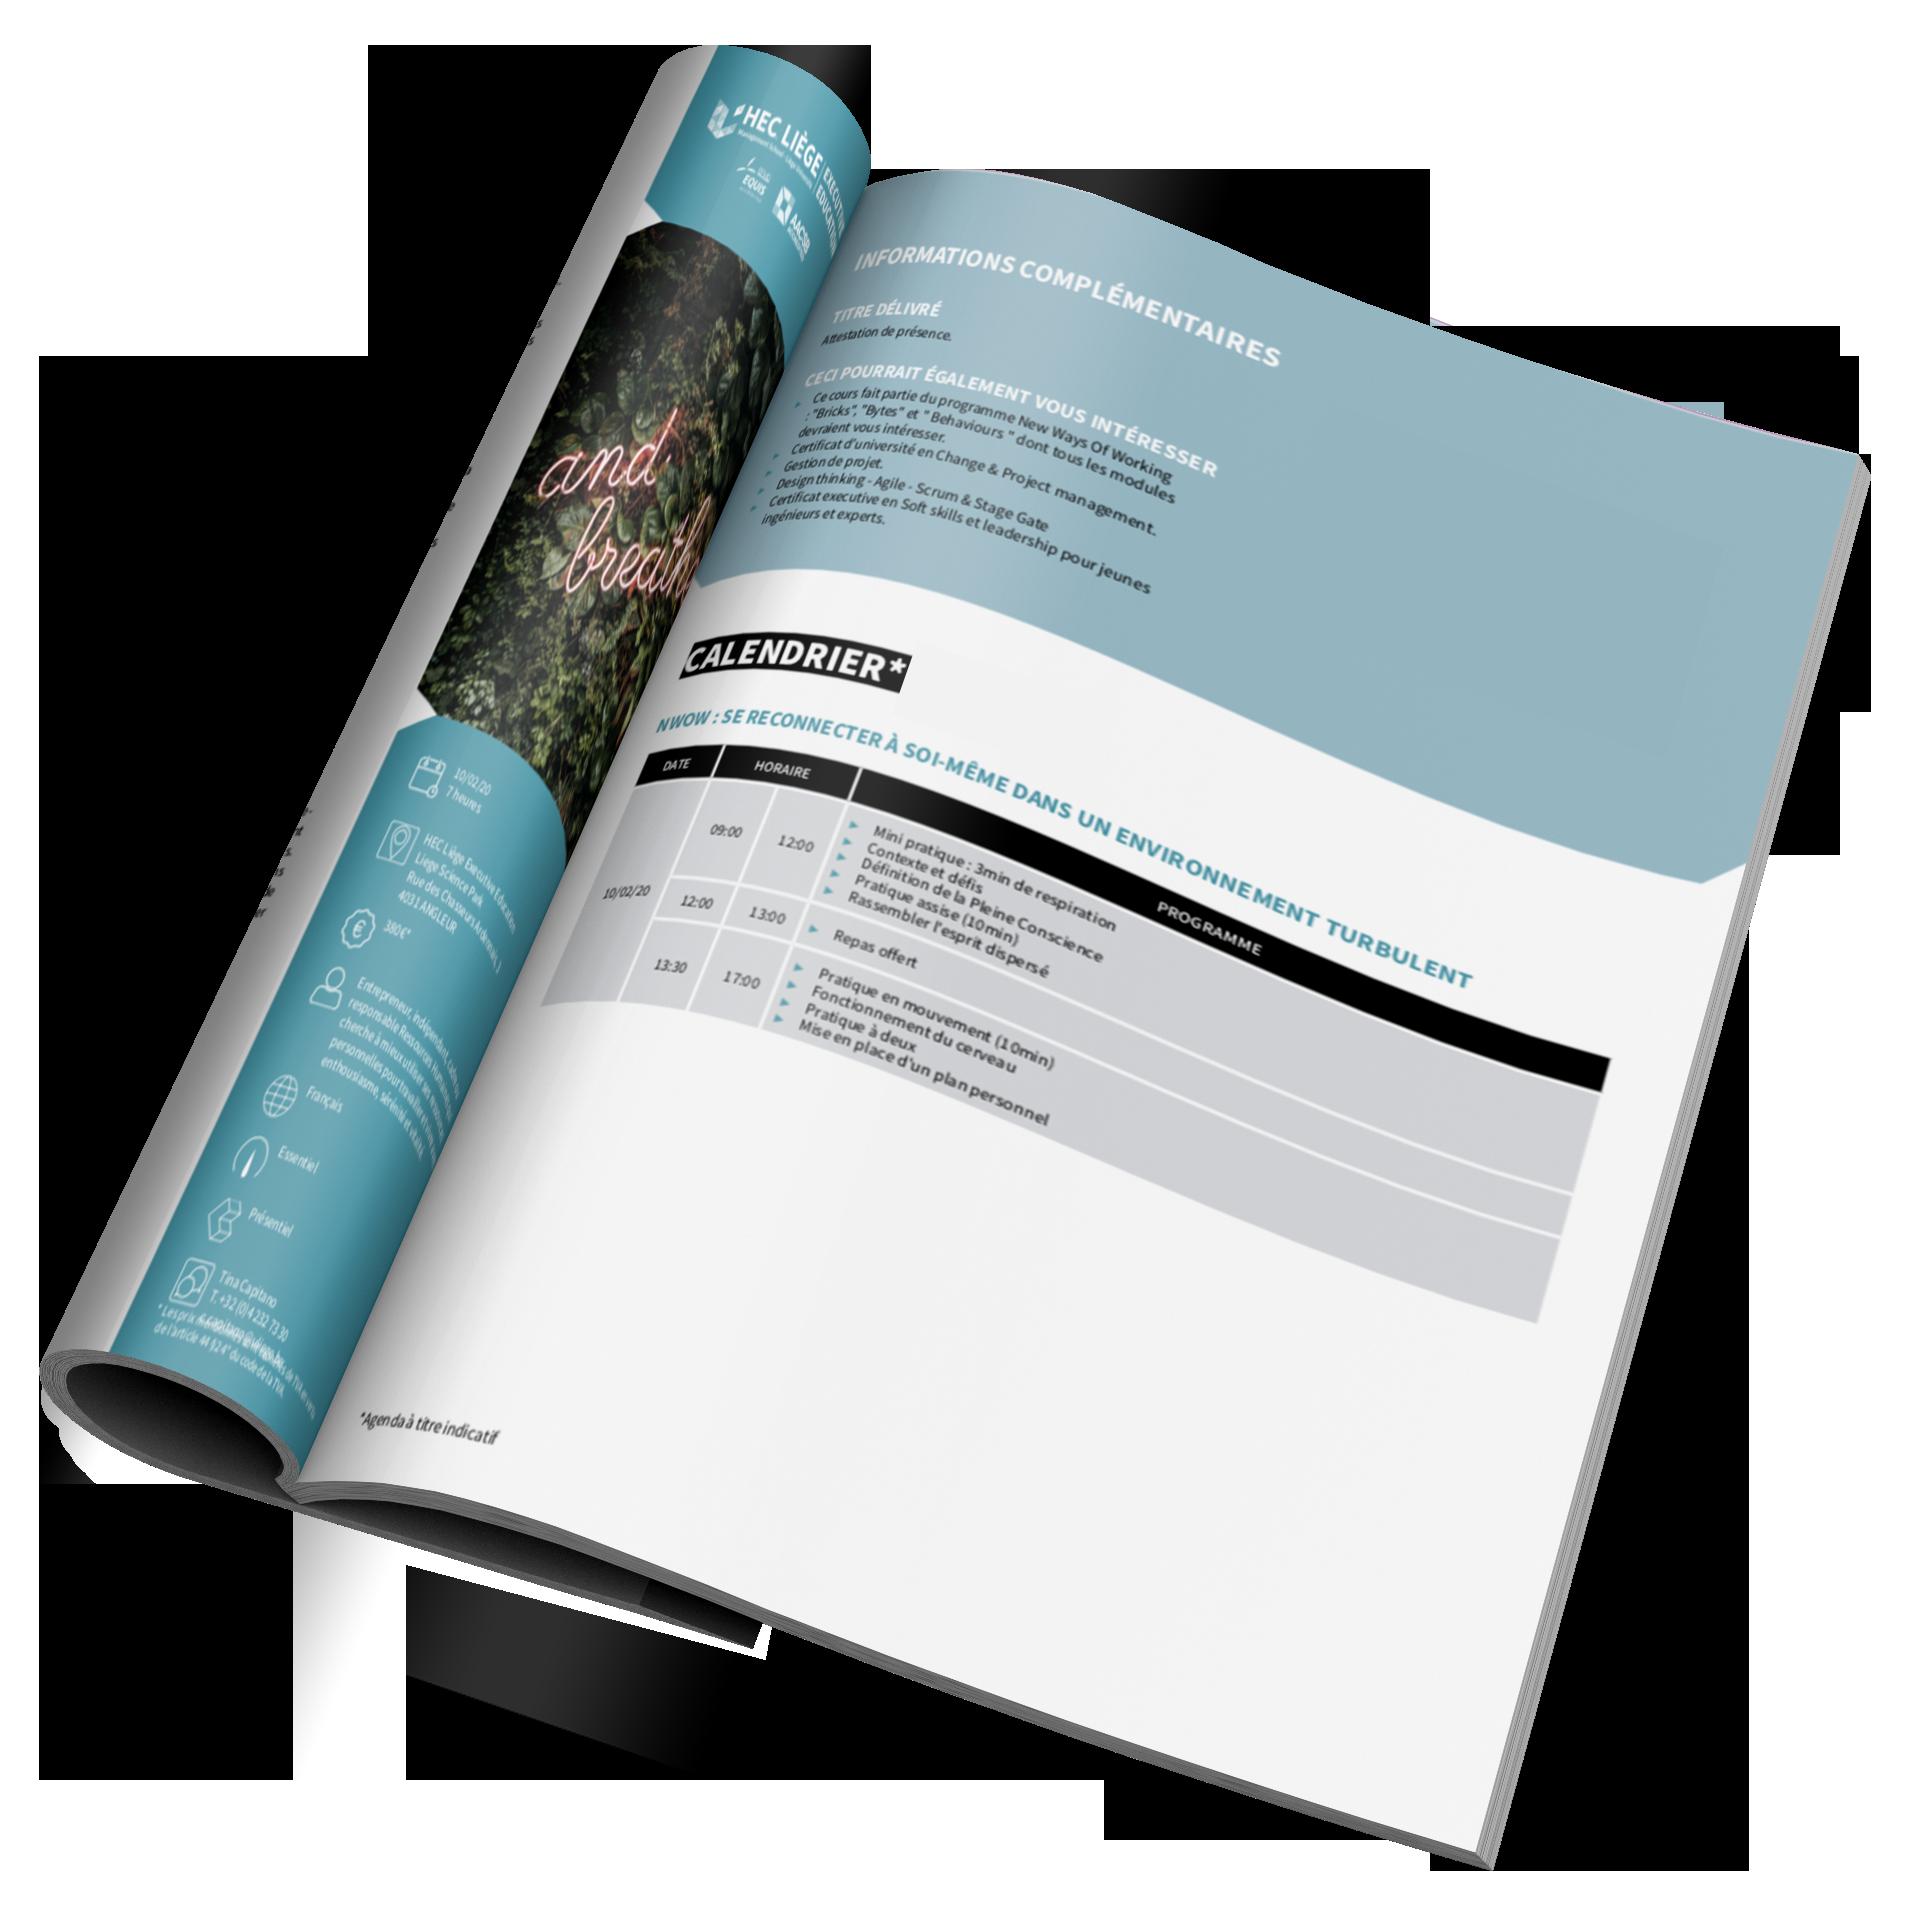 Catalogue digital transformation innovation and change